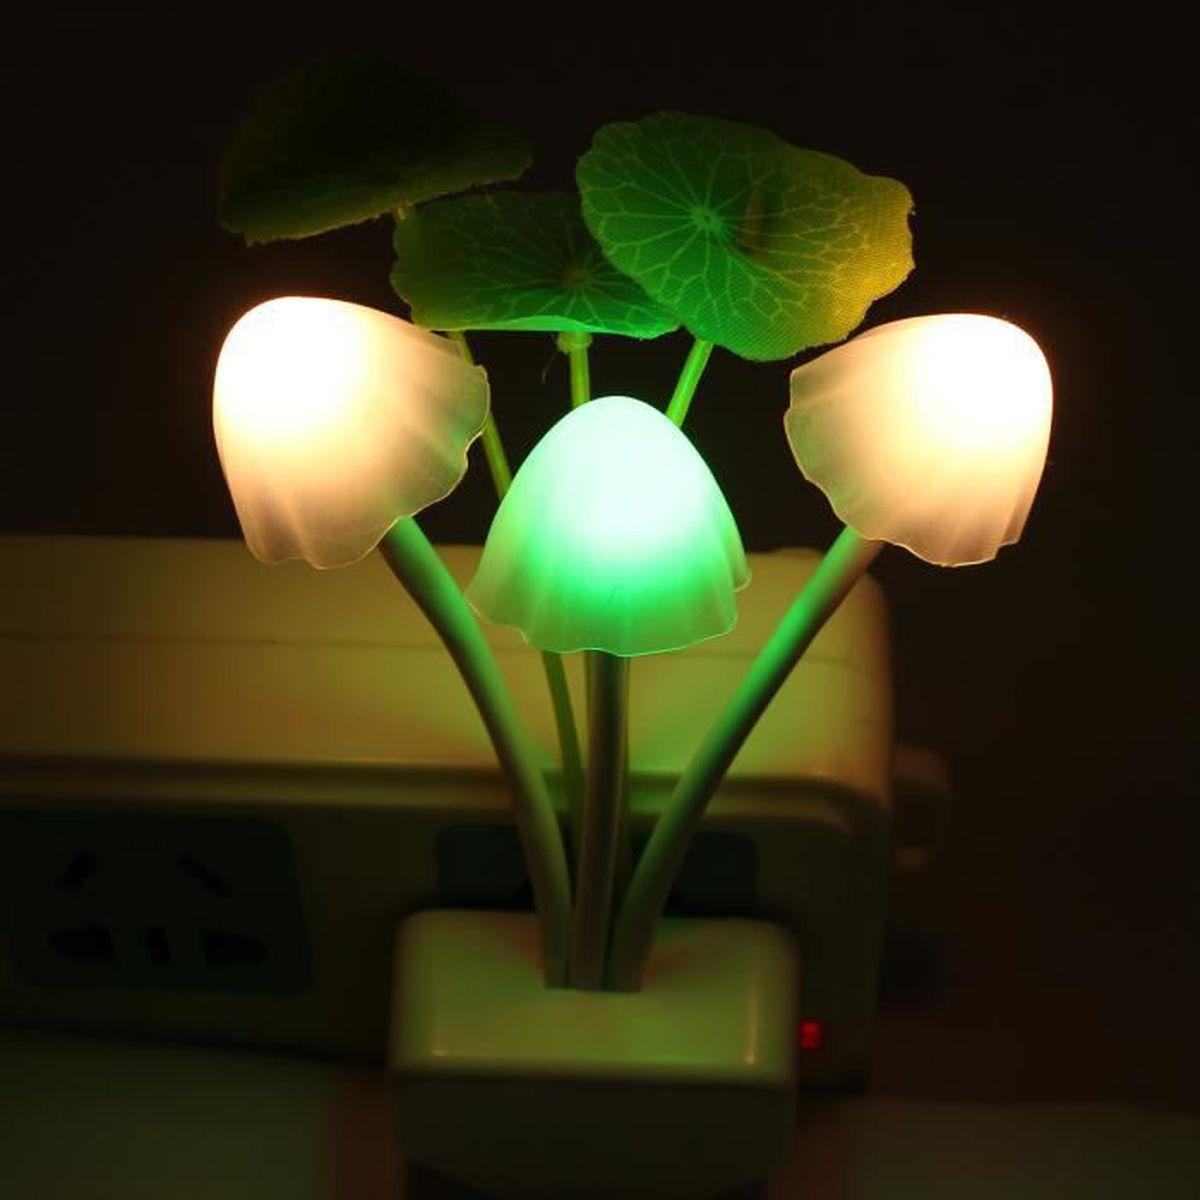 Lampe Veilleuse Lapin Miffy led lampe changement veilleuse mushroom rose lapin auto sensor couleur  chambre type a tu